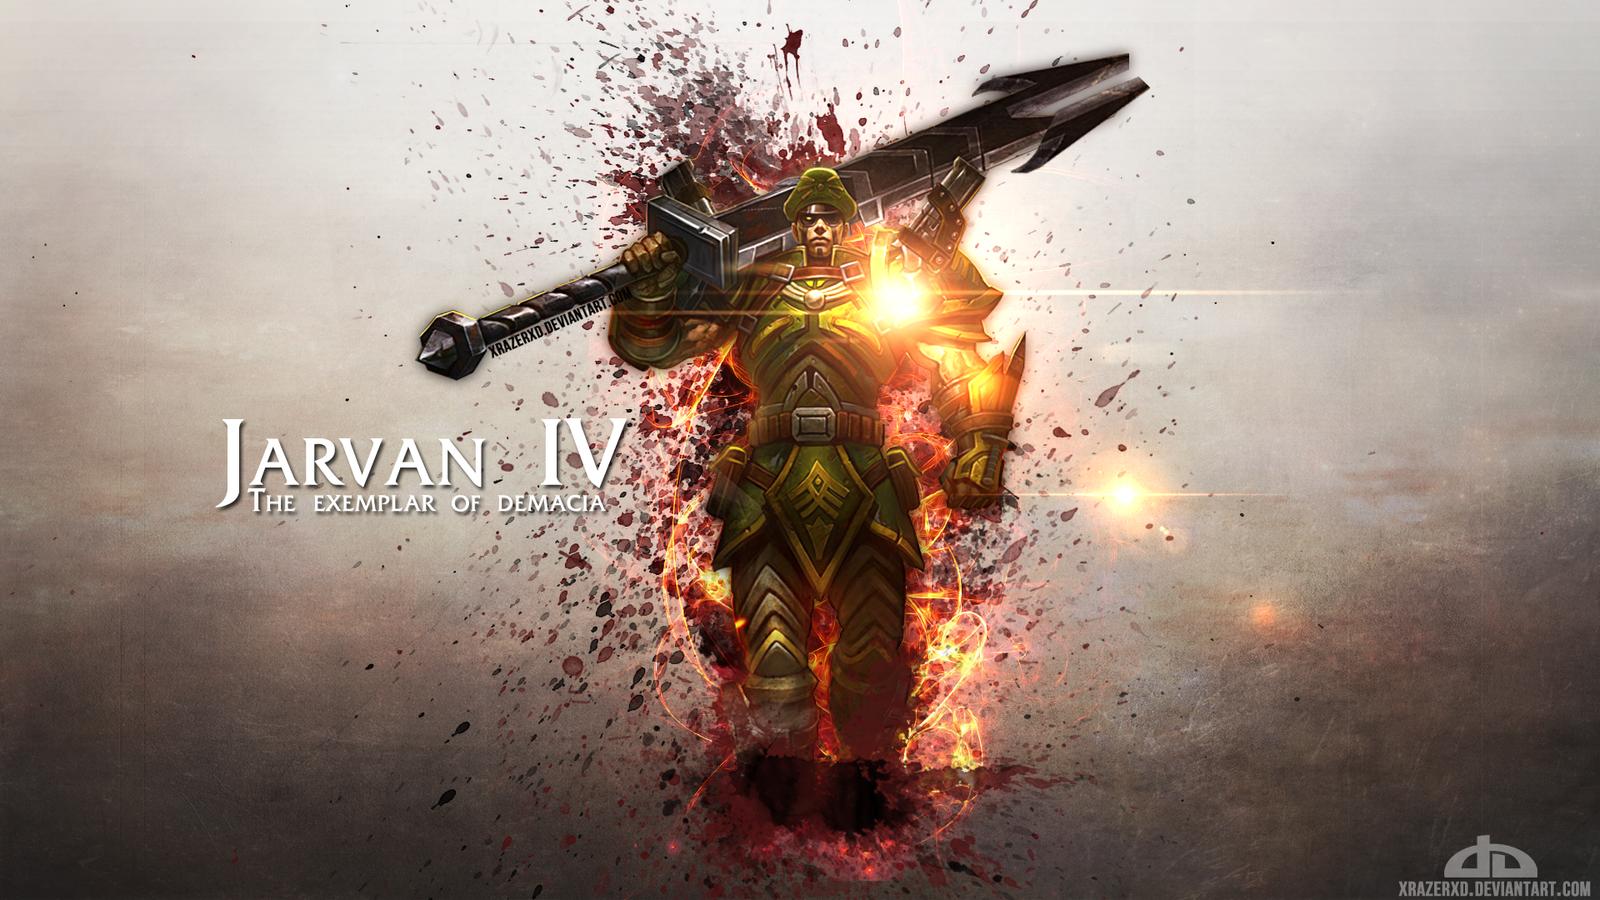 League of legends jarvan iv